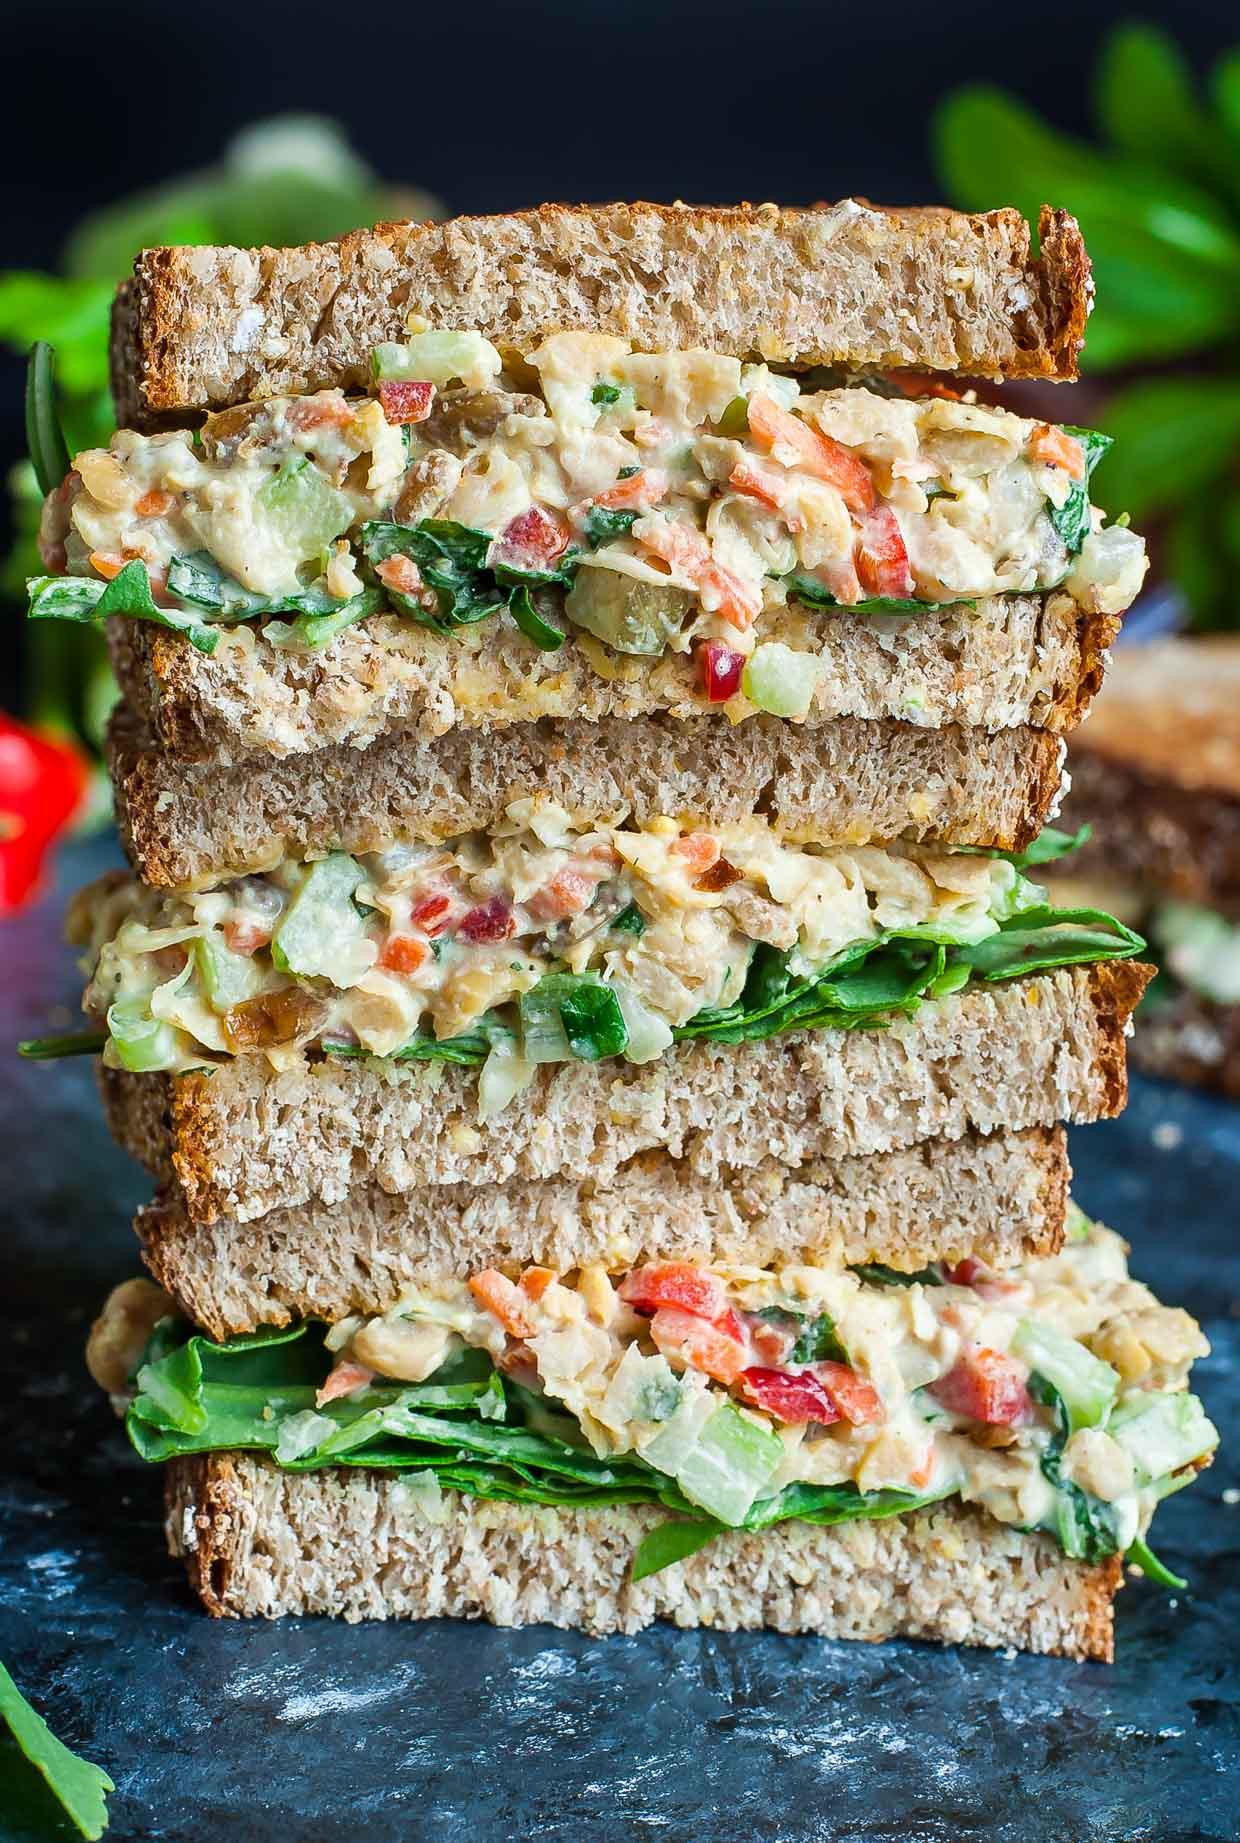 Healthy Vegetarian Sandwich Recipes  Garden Veggie Chickpea Salad Sandwich Peas And Crayons